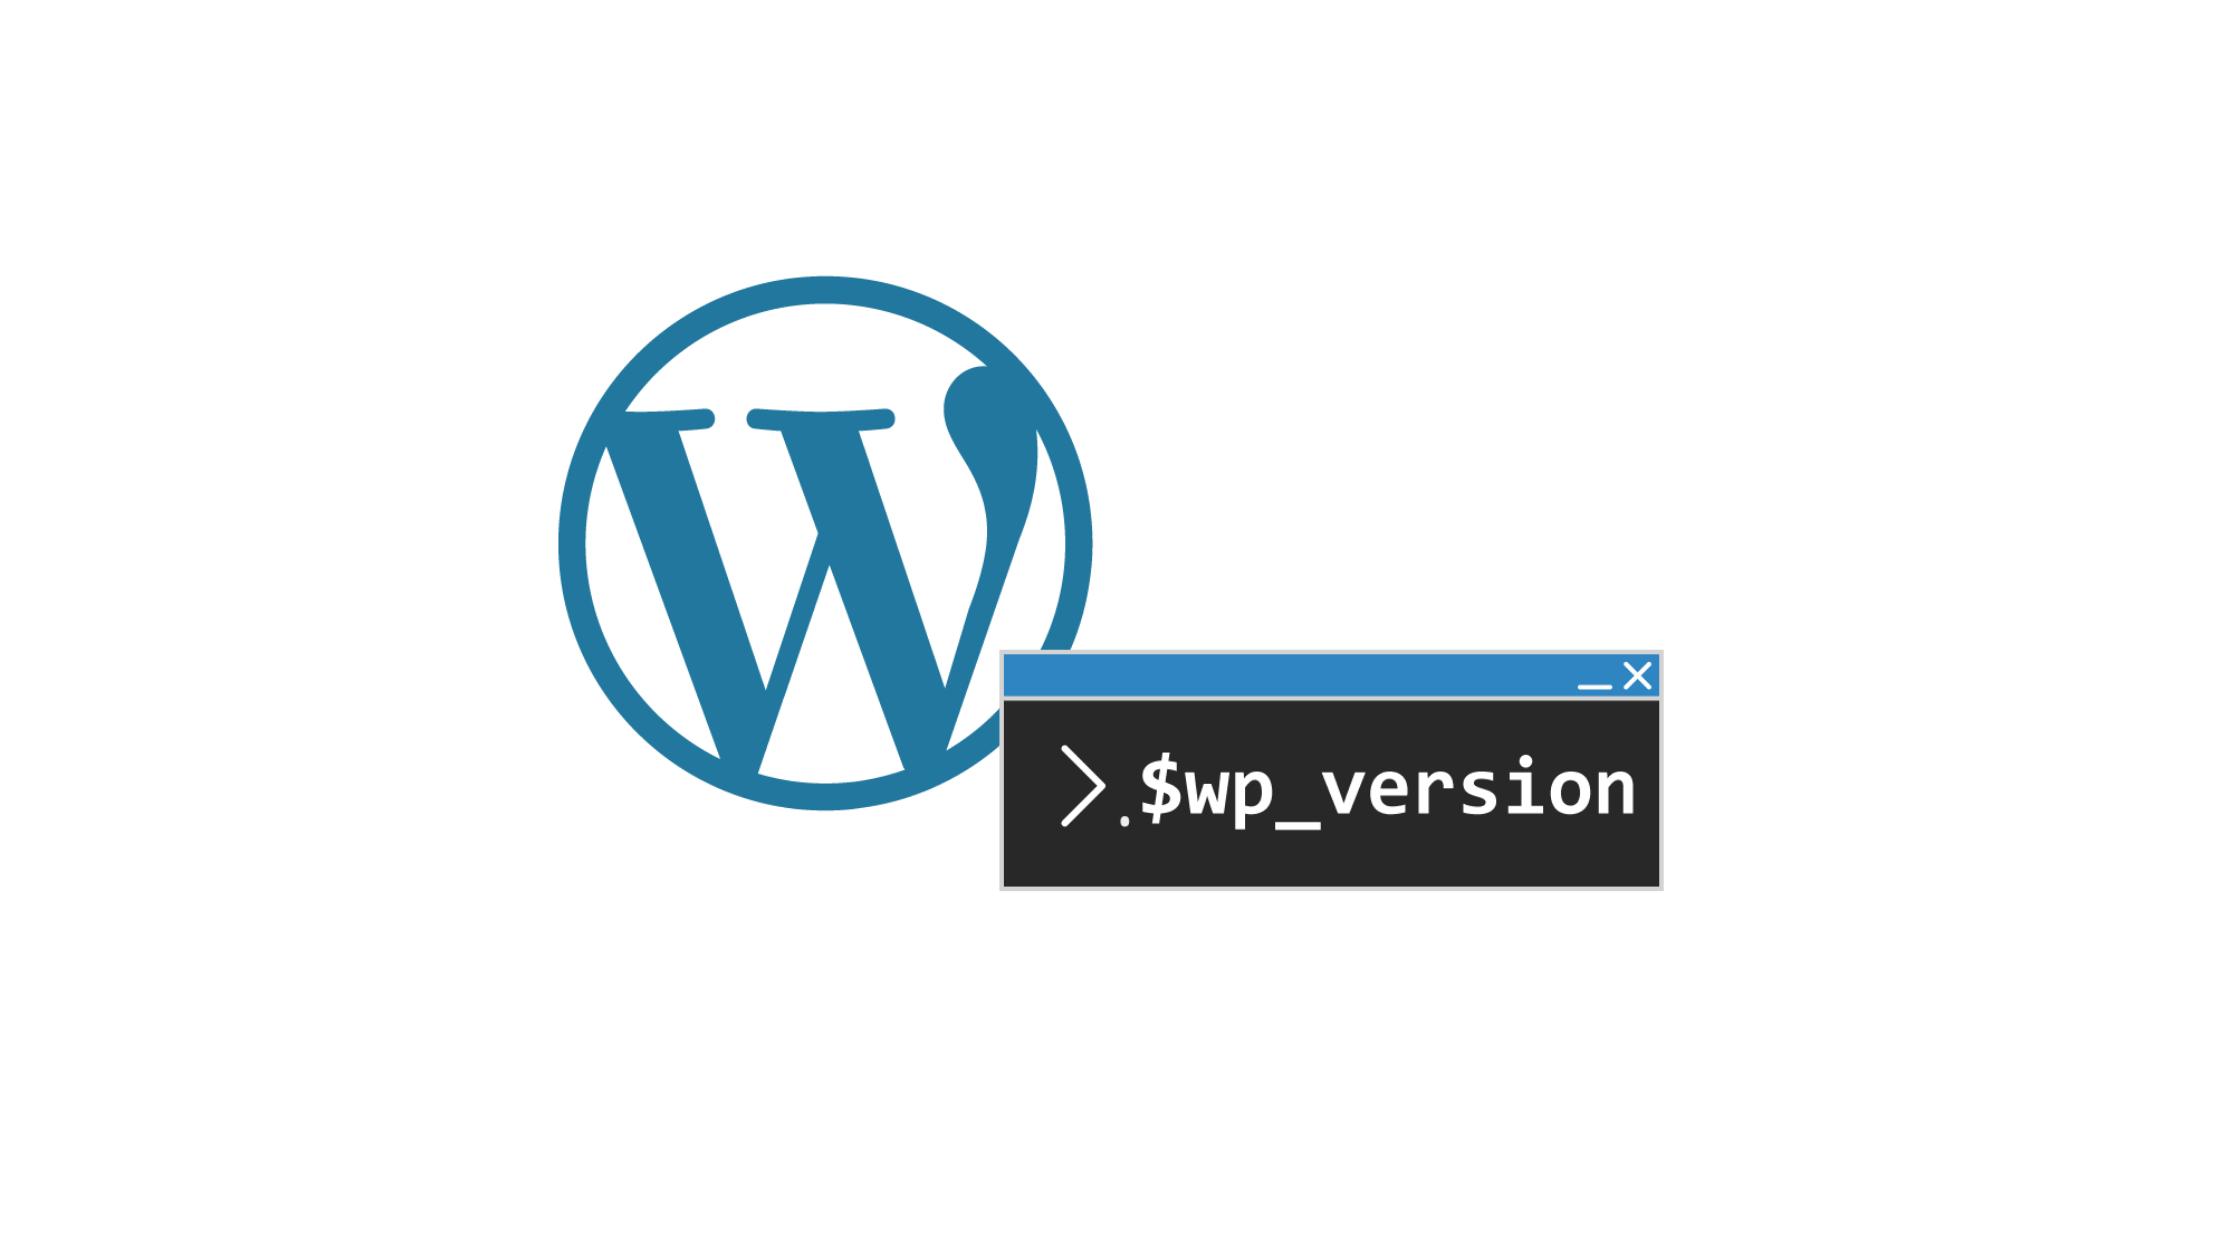 wp-version